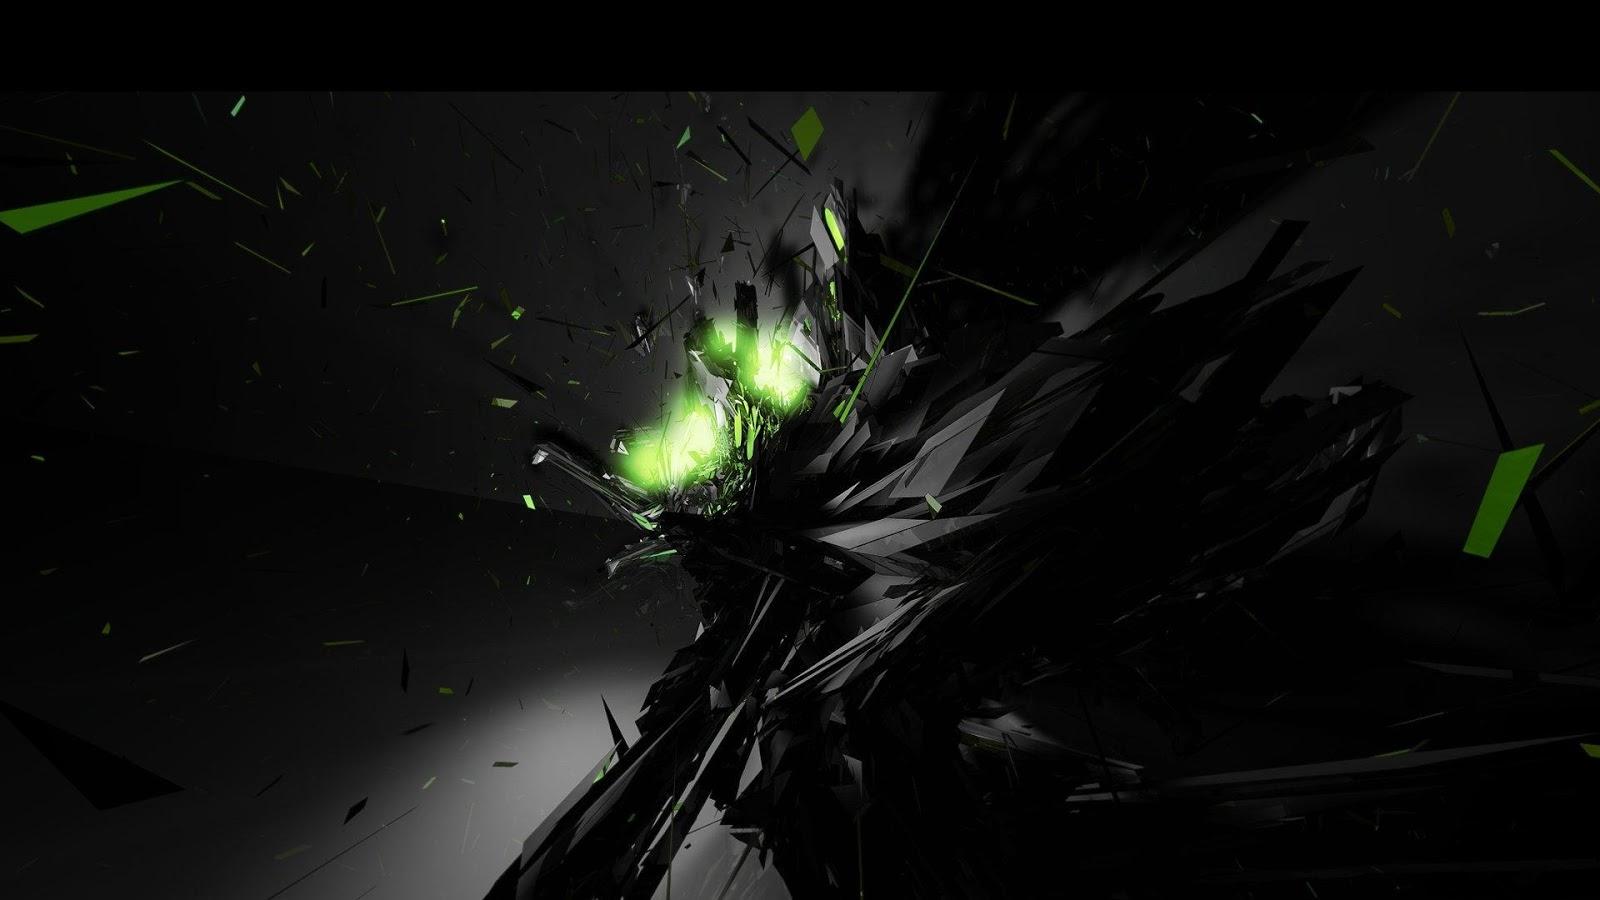 Abstract Full HD Desktop | HD Wallpapers (High Definition ... Abstract Green Desktop Wallpaper